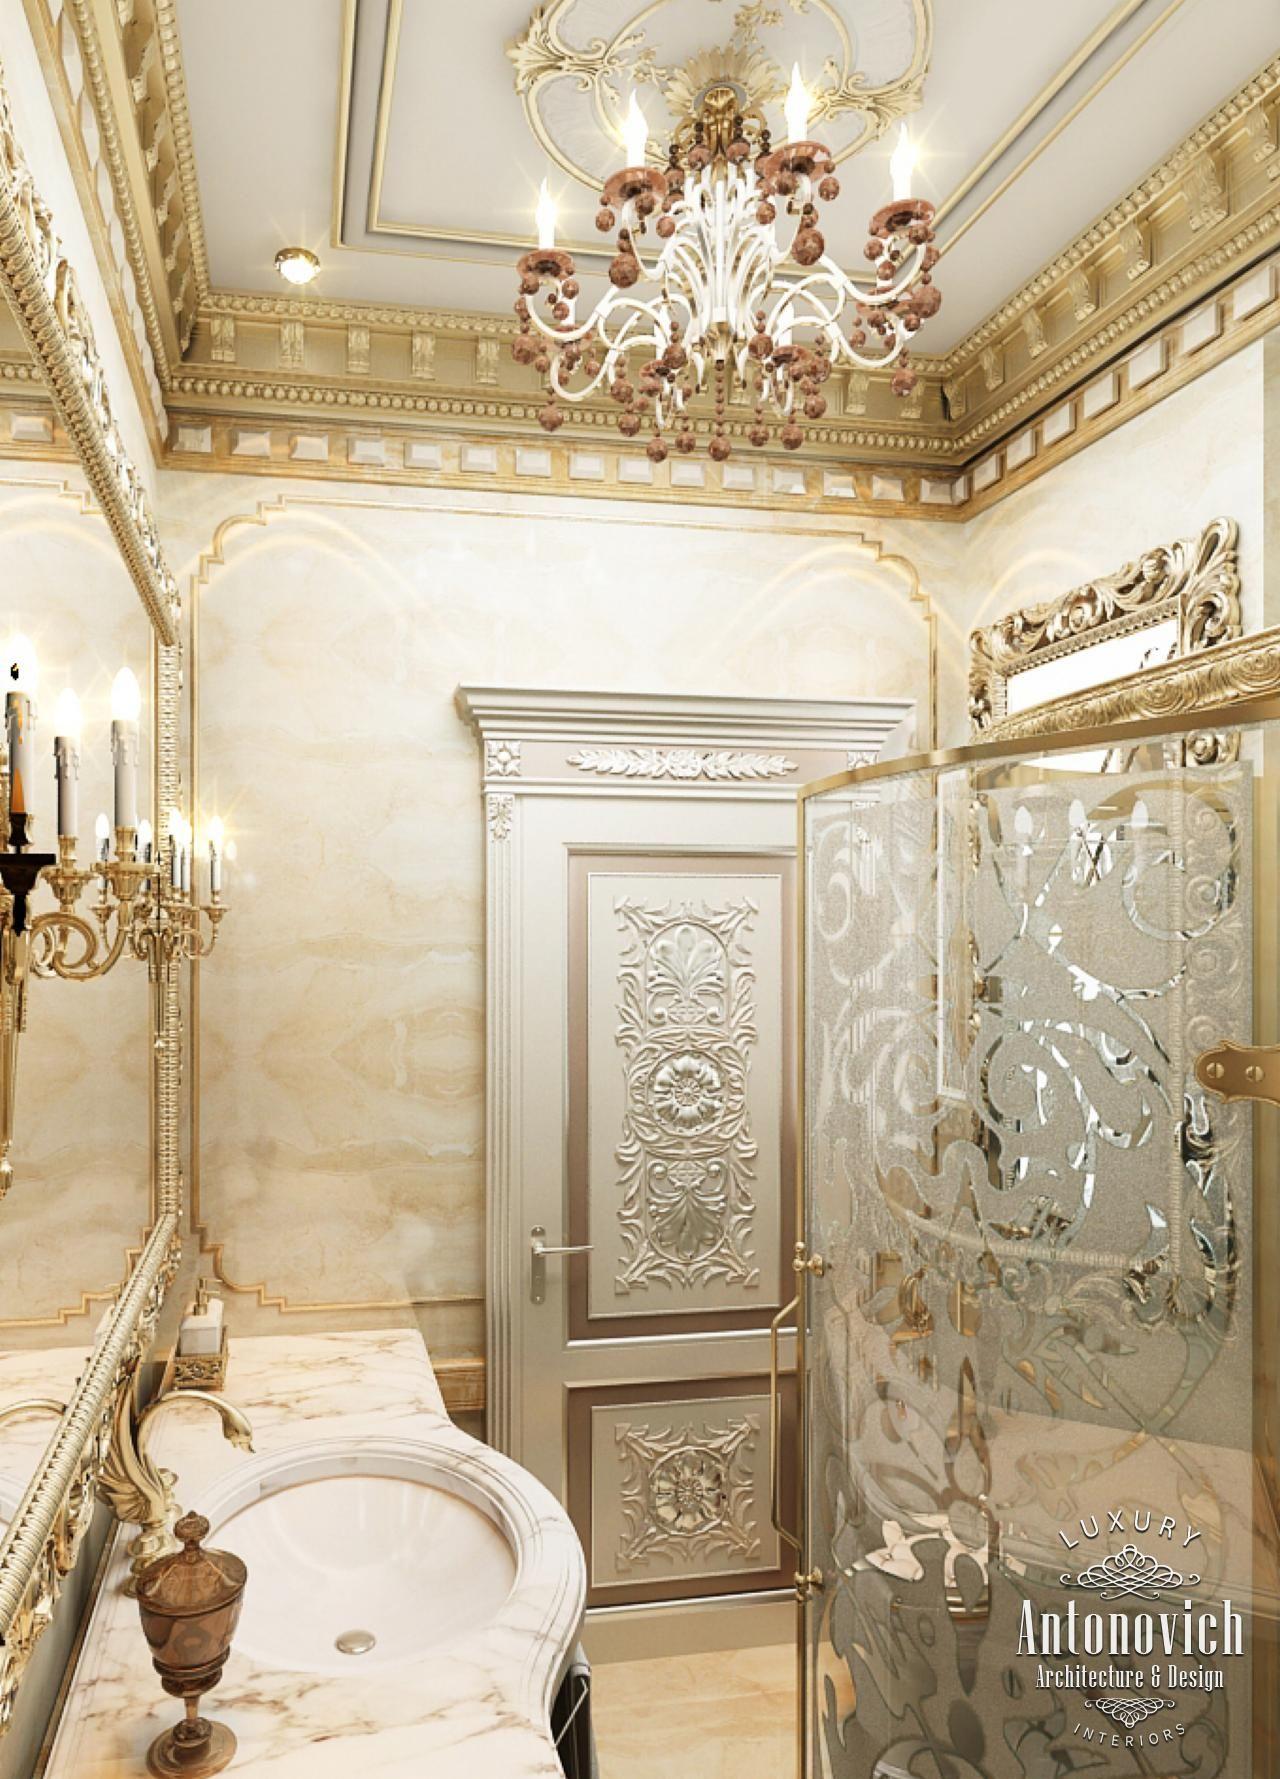 Ceiling Design Dubai - Google Keresés